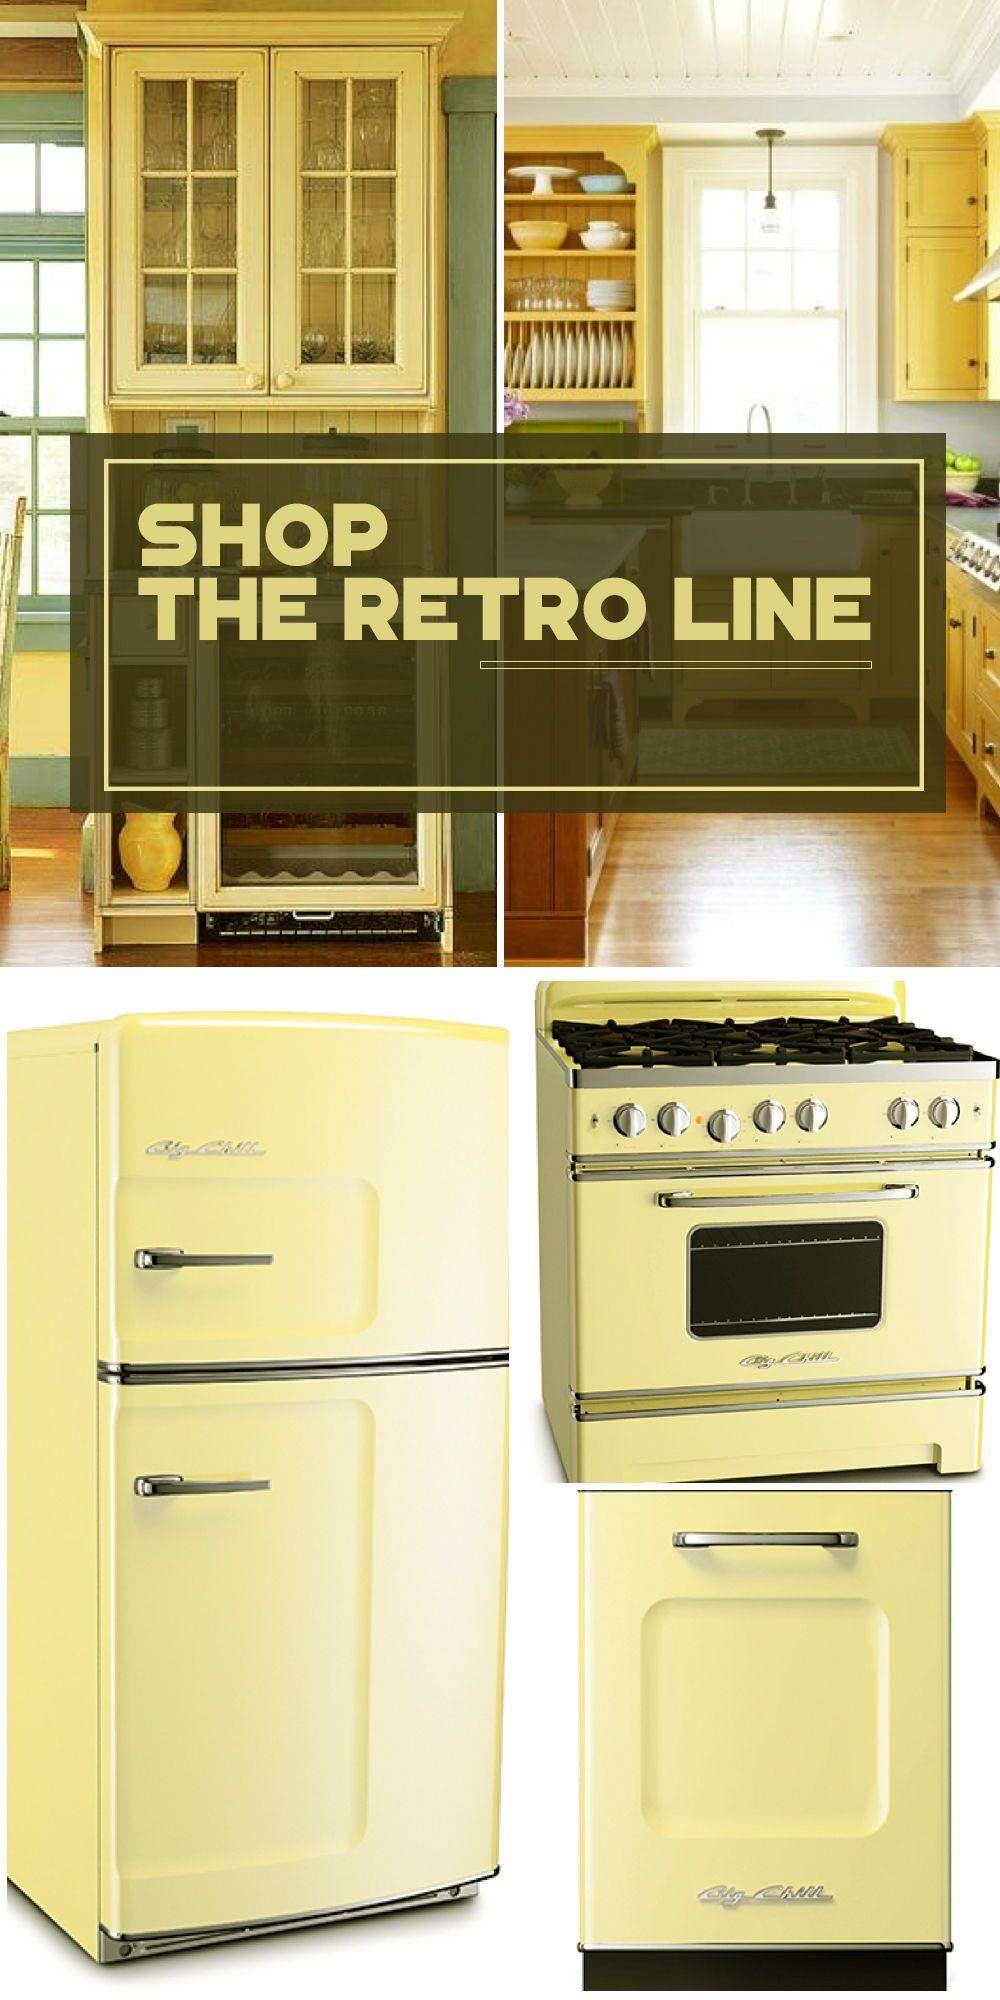 Loving Big Chill S Retro Fridges A Bit Funkier And Cooler Than Smeg Fridge Smeg Retro Retro Appliances Retro Kitchen Appliances Retro Kitchen